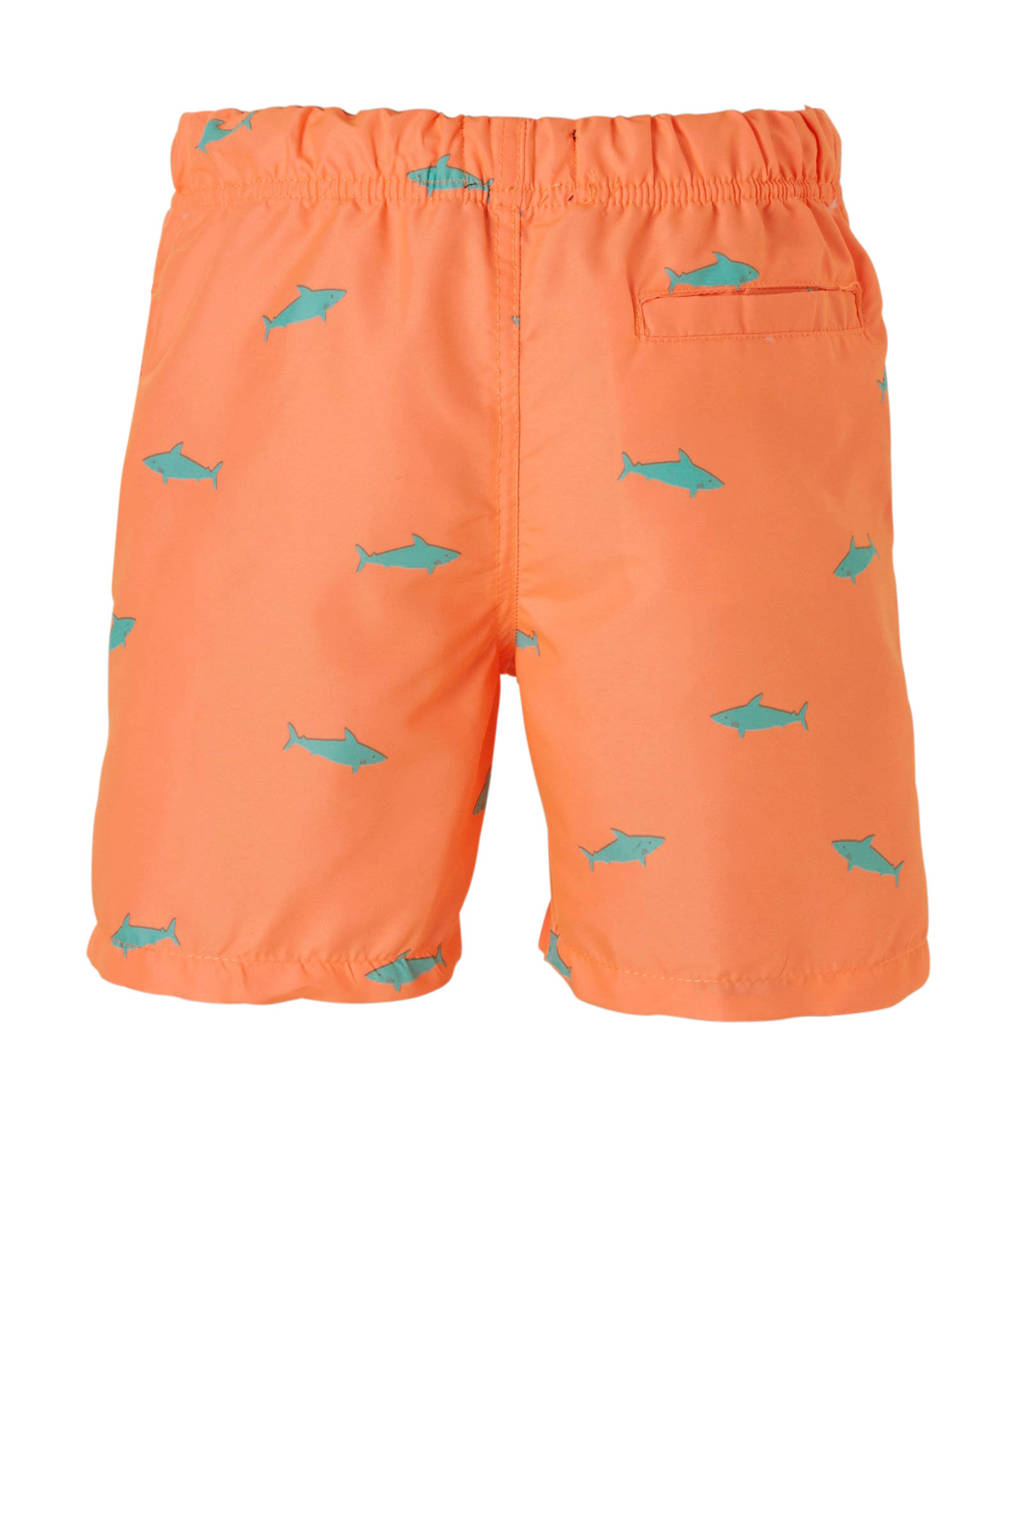 Shiwi zwemshort met all over print oranje, Oranje/groen